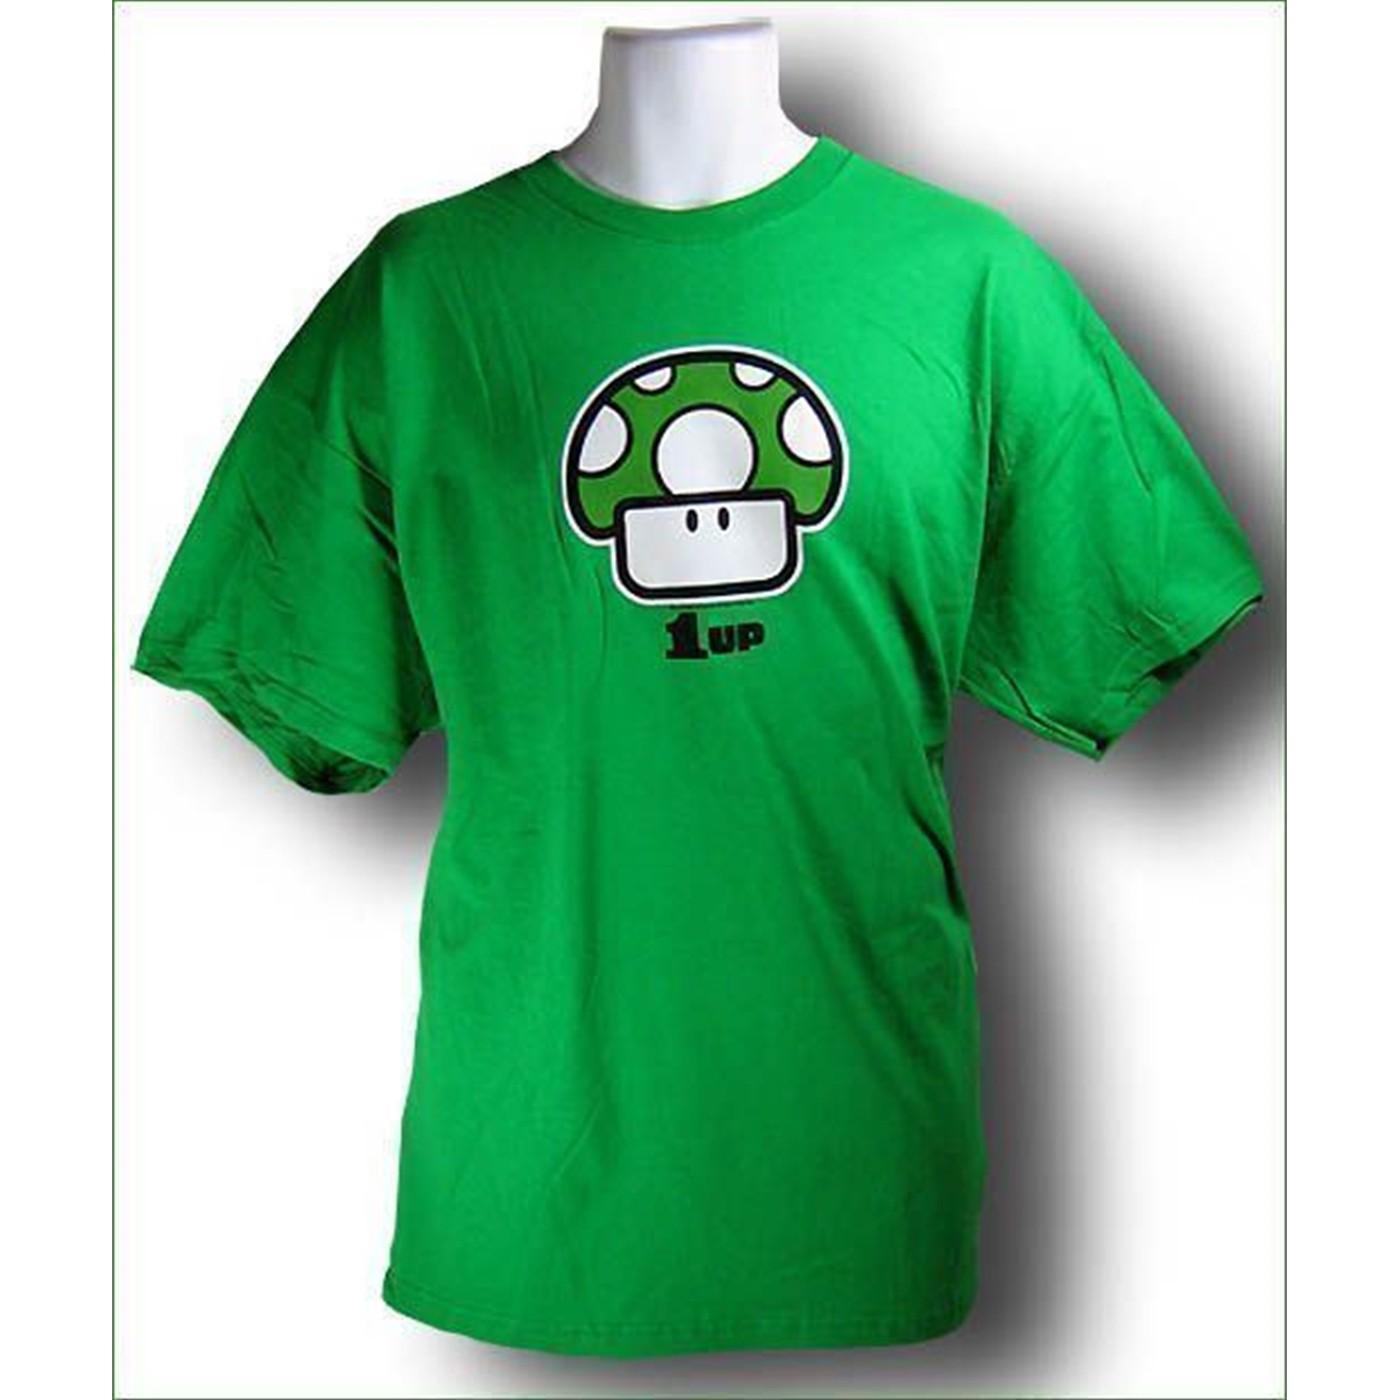 Nintendo 1 Up Mushroom T-Shirt